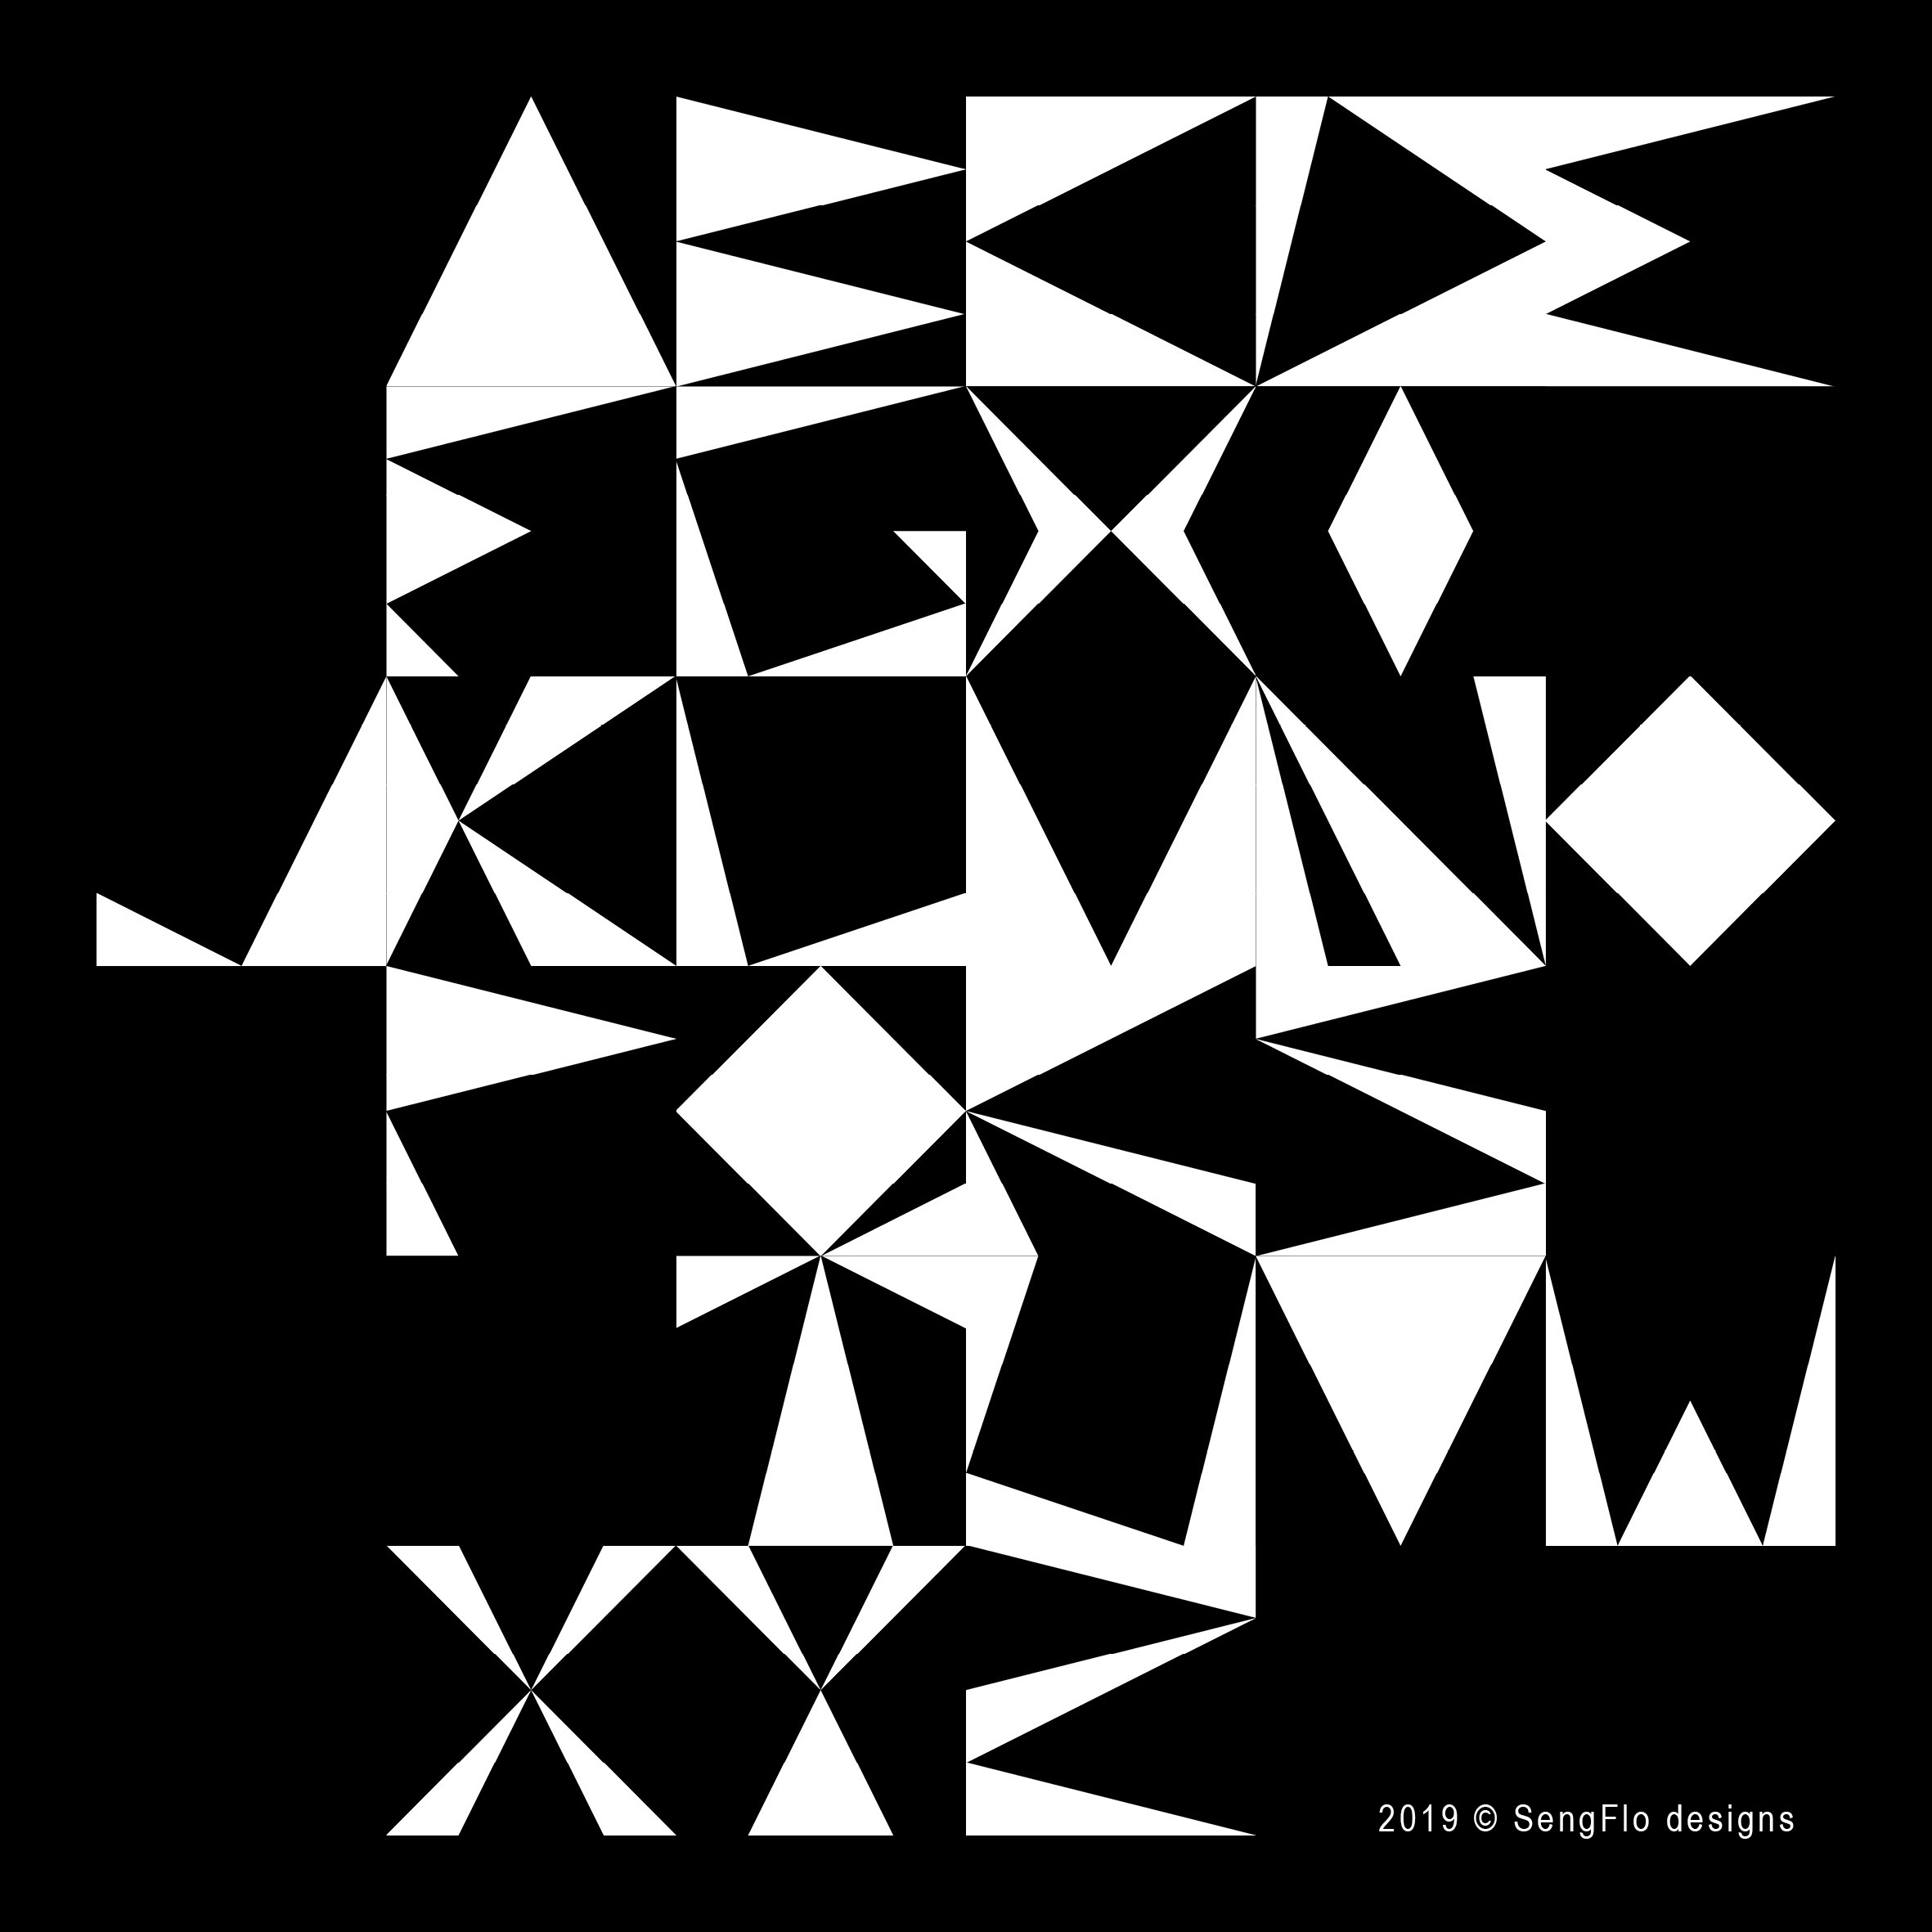 SFd_Alphabet Typo Triangles_alphabet_inv